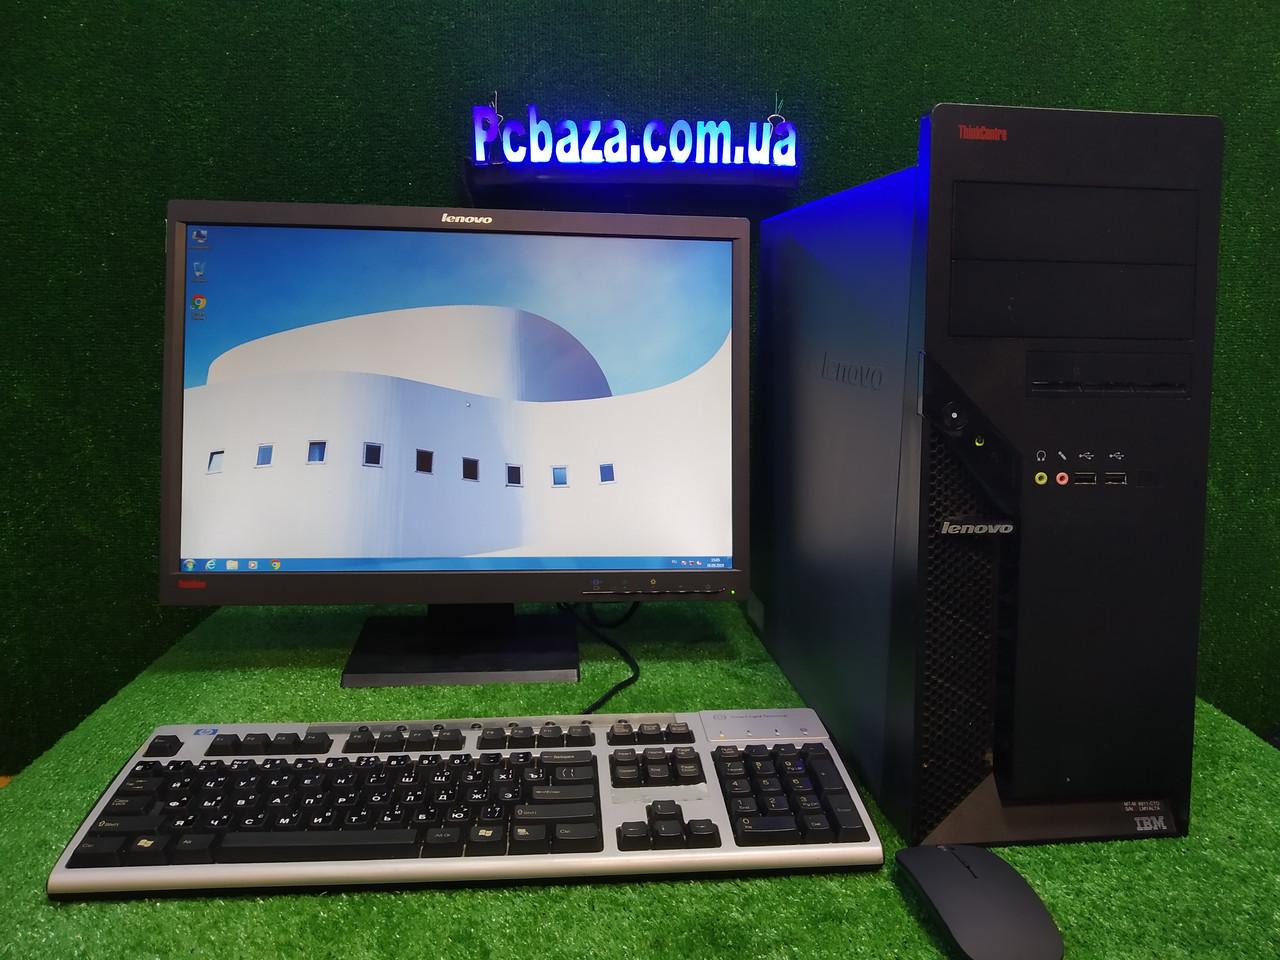 "Комплект Lenovo M55, 4 ядра, 4 ГБ ОЗУ, 500 Гб HDD + монитор 22"" Lenovo , Полностью настроен!"